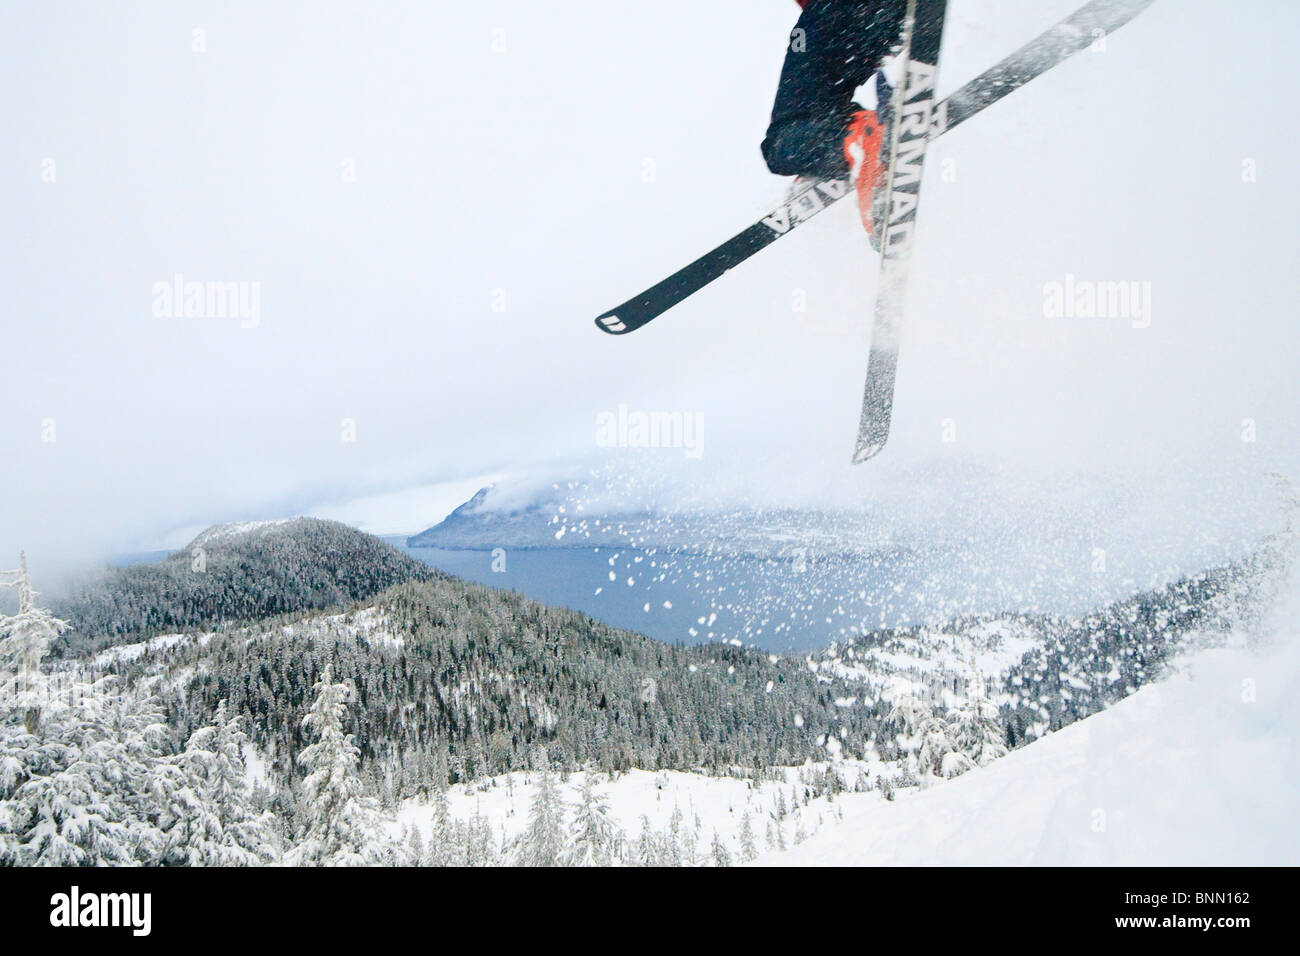 Backcountry skier jumps into deep powder, Wrangell Island, Tongass National Forest, Alaska - Stock Image